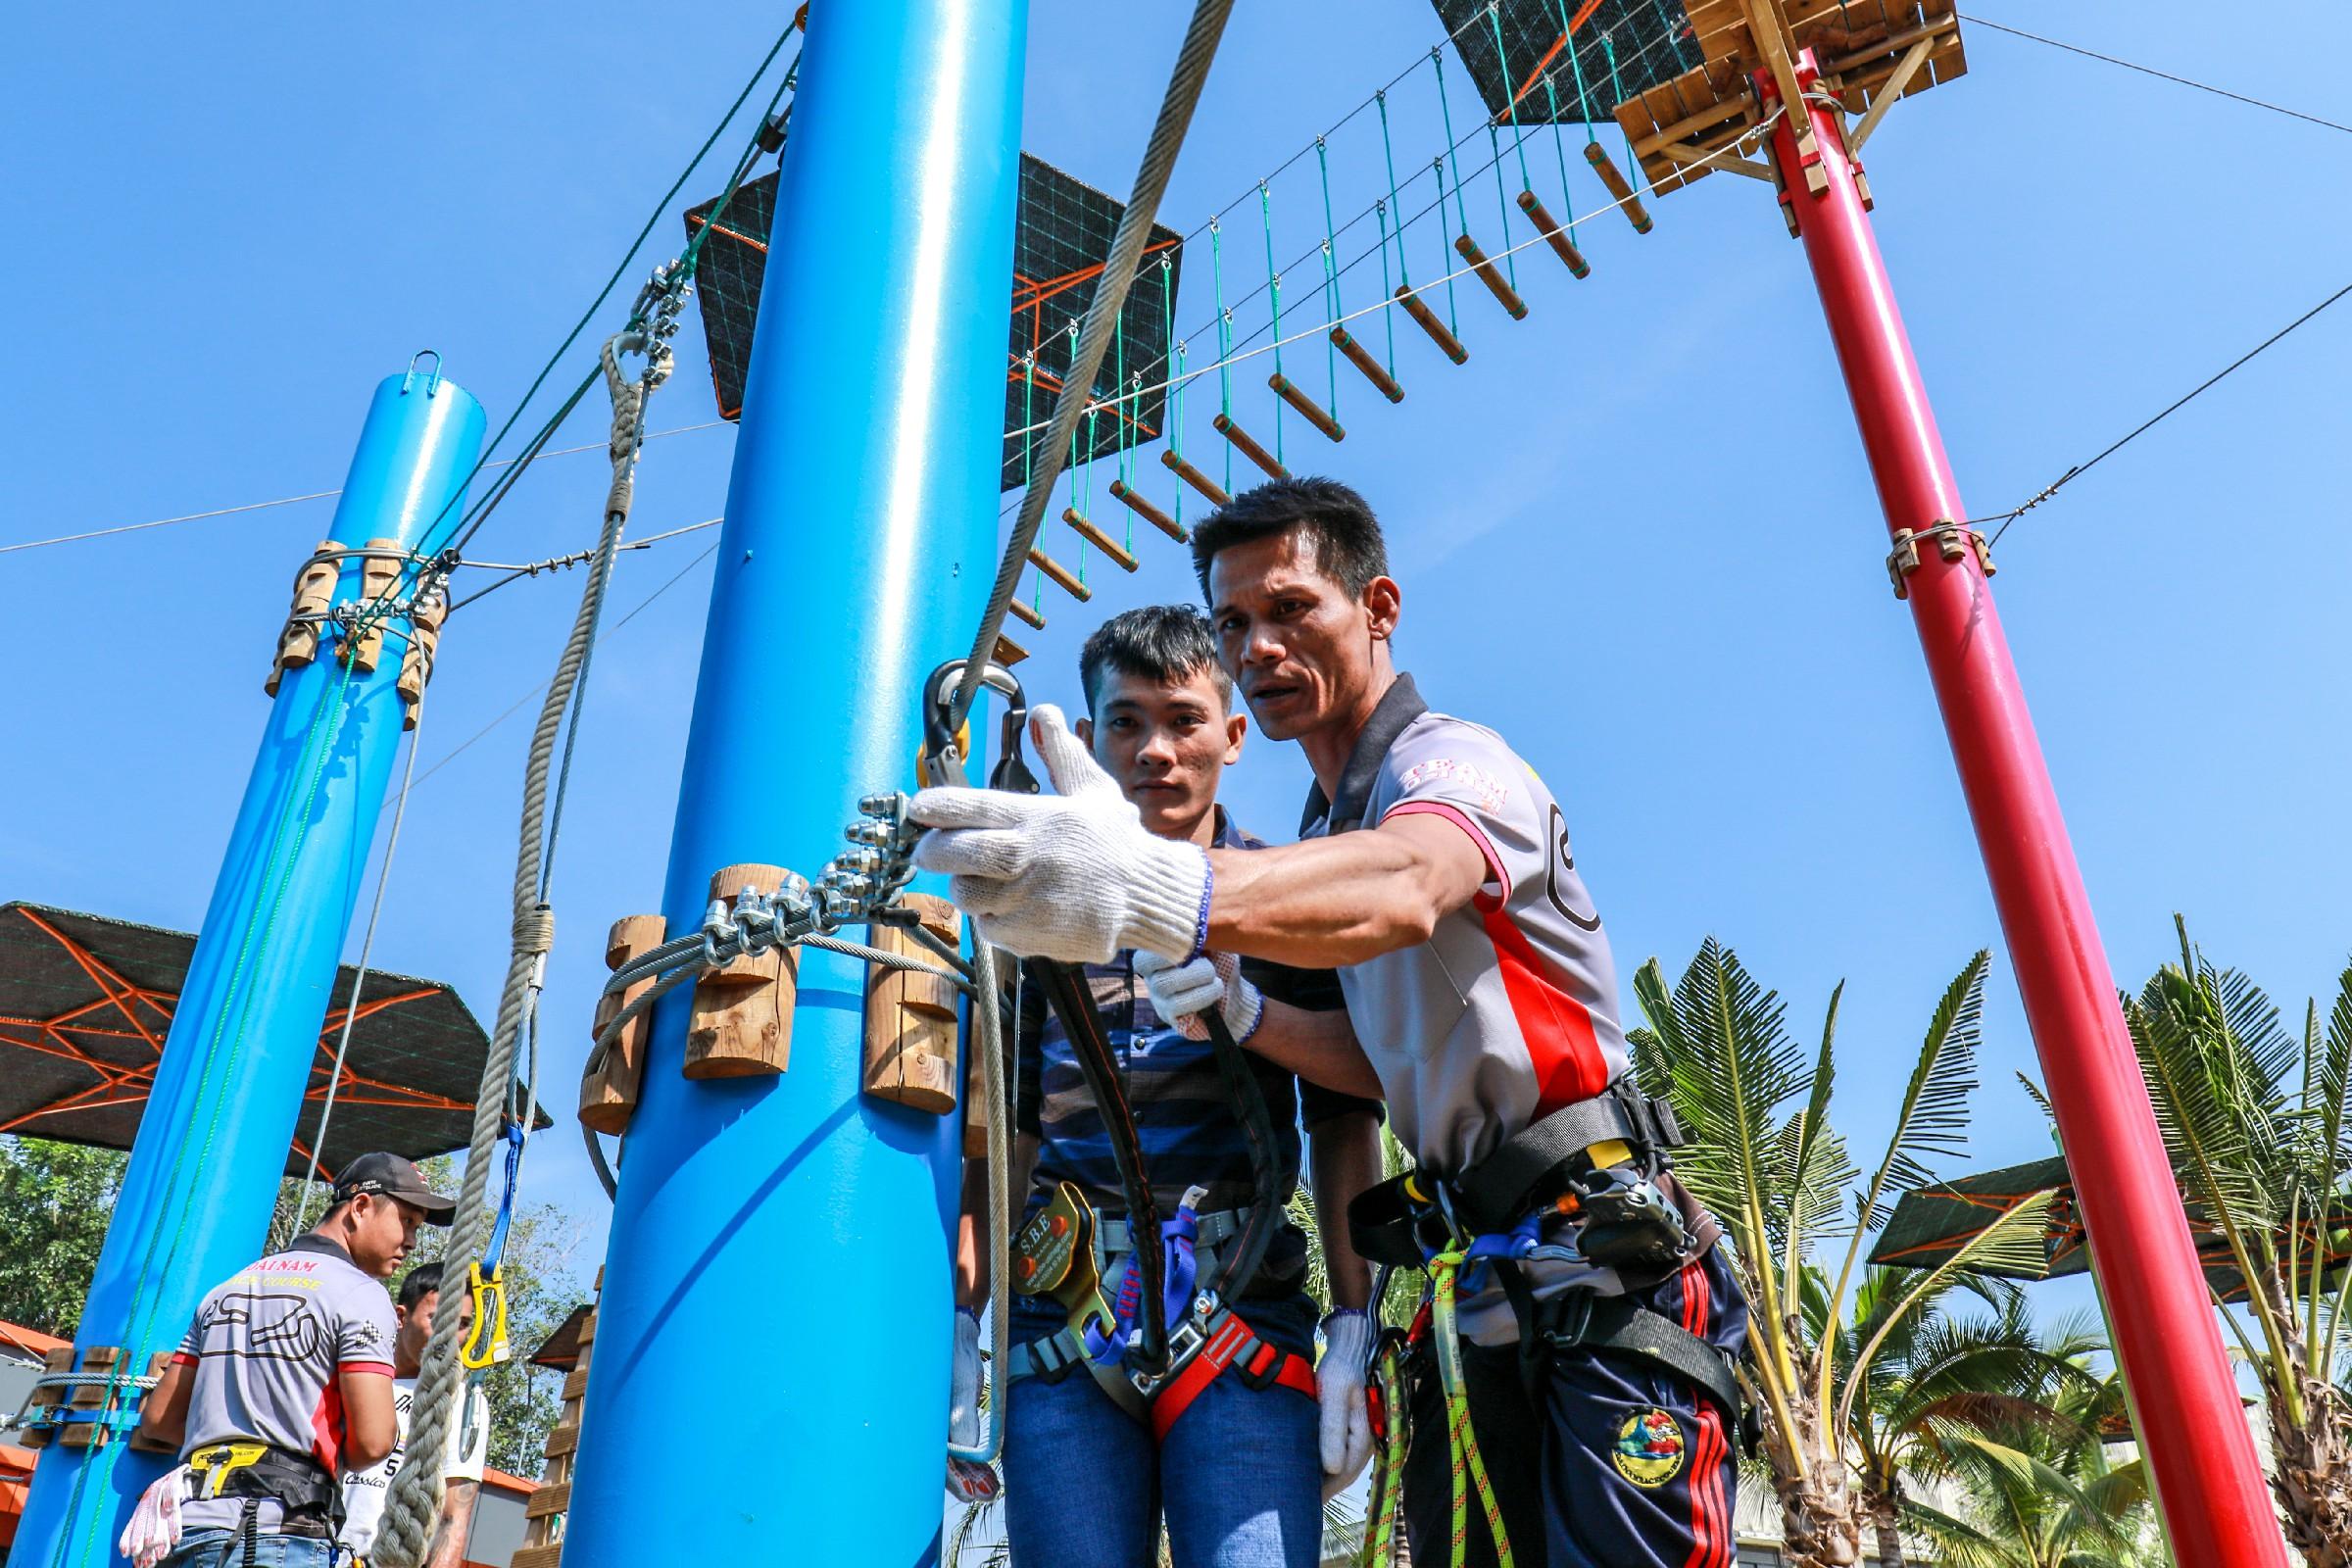 dai nam high ropes course